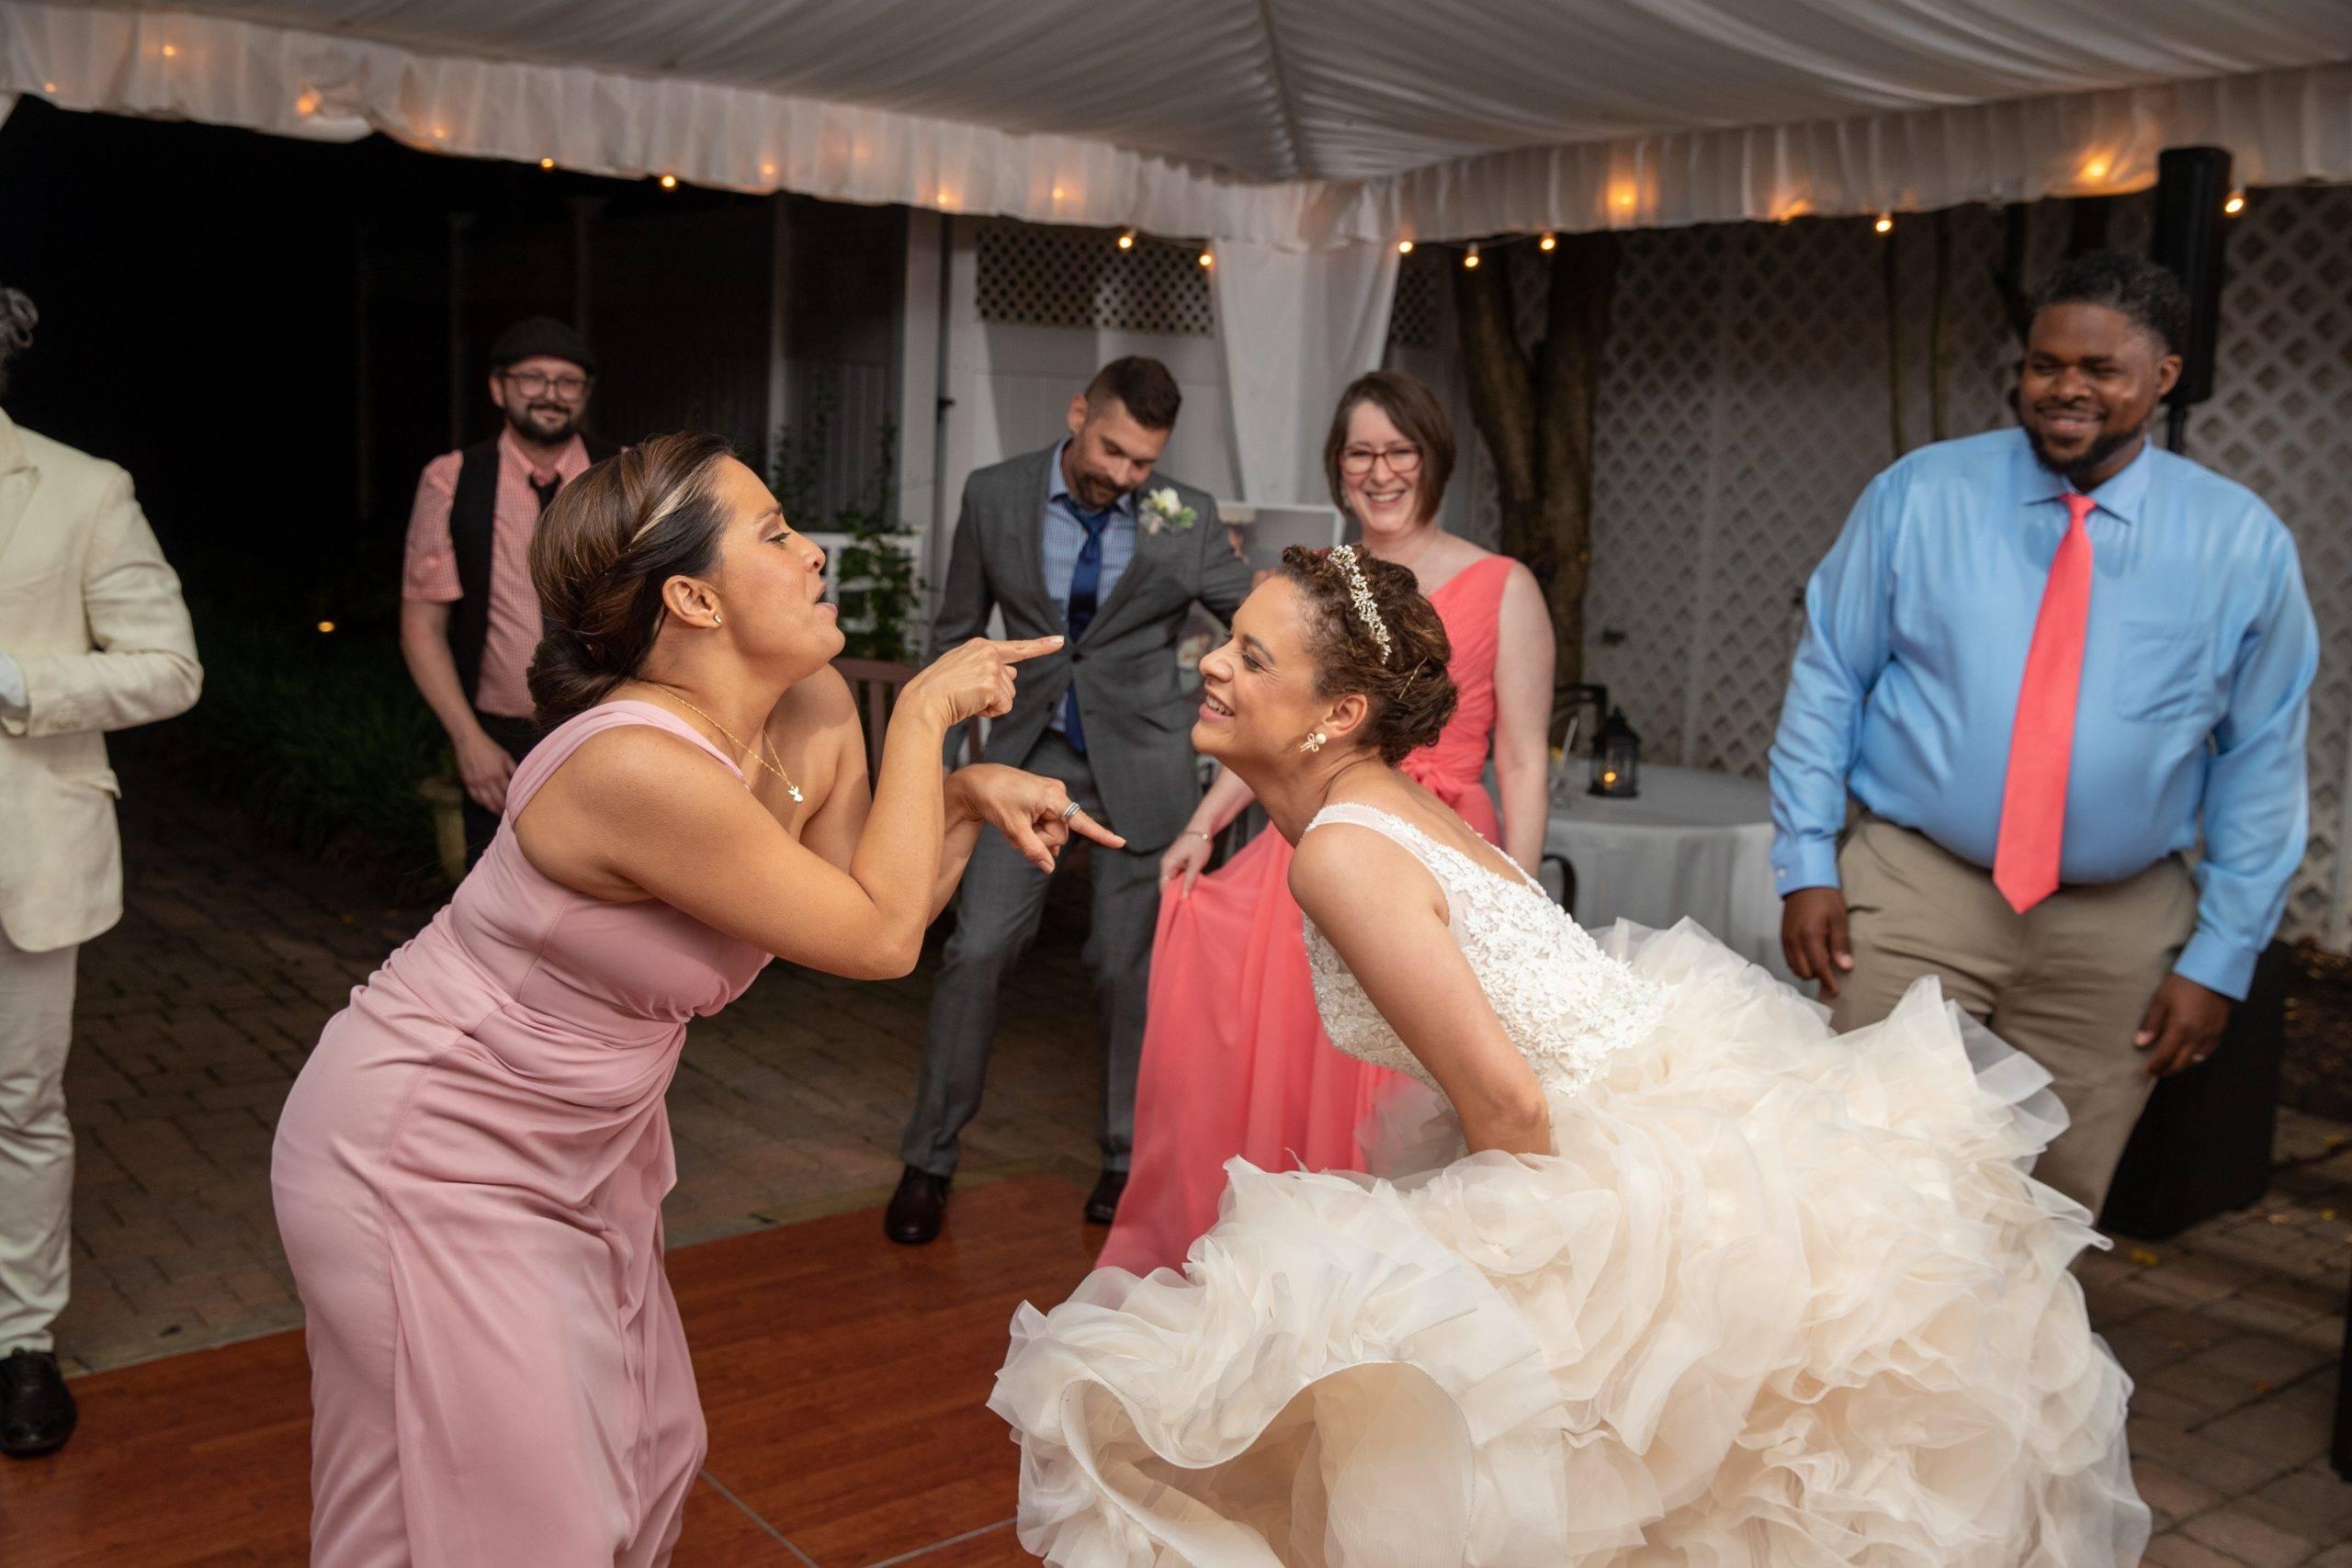 Olde Mill Inn bride and bridesmaid dancing at reception